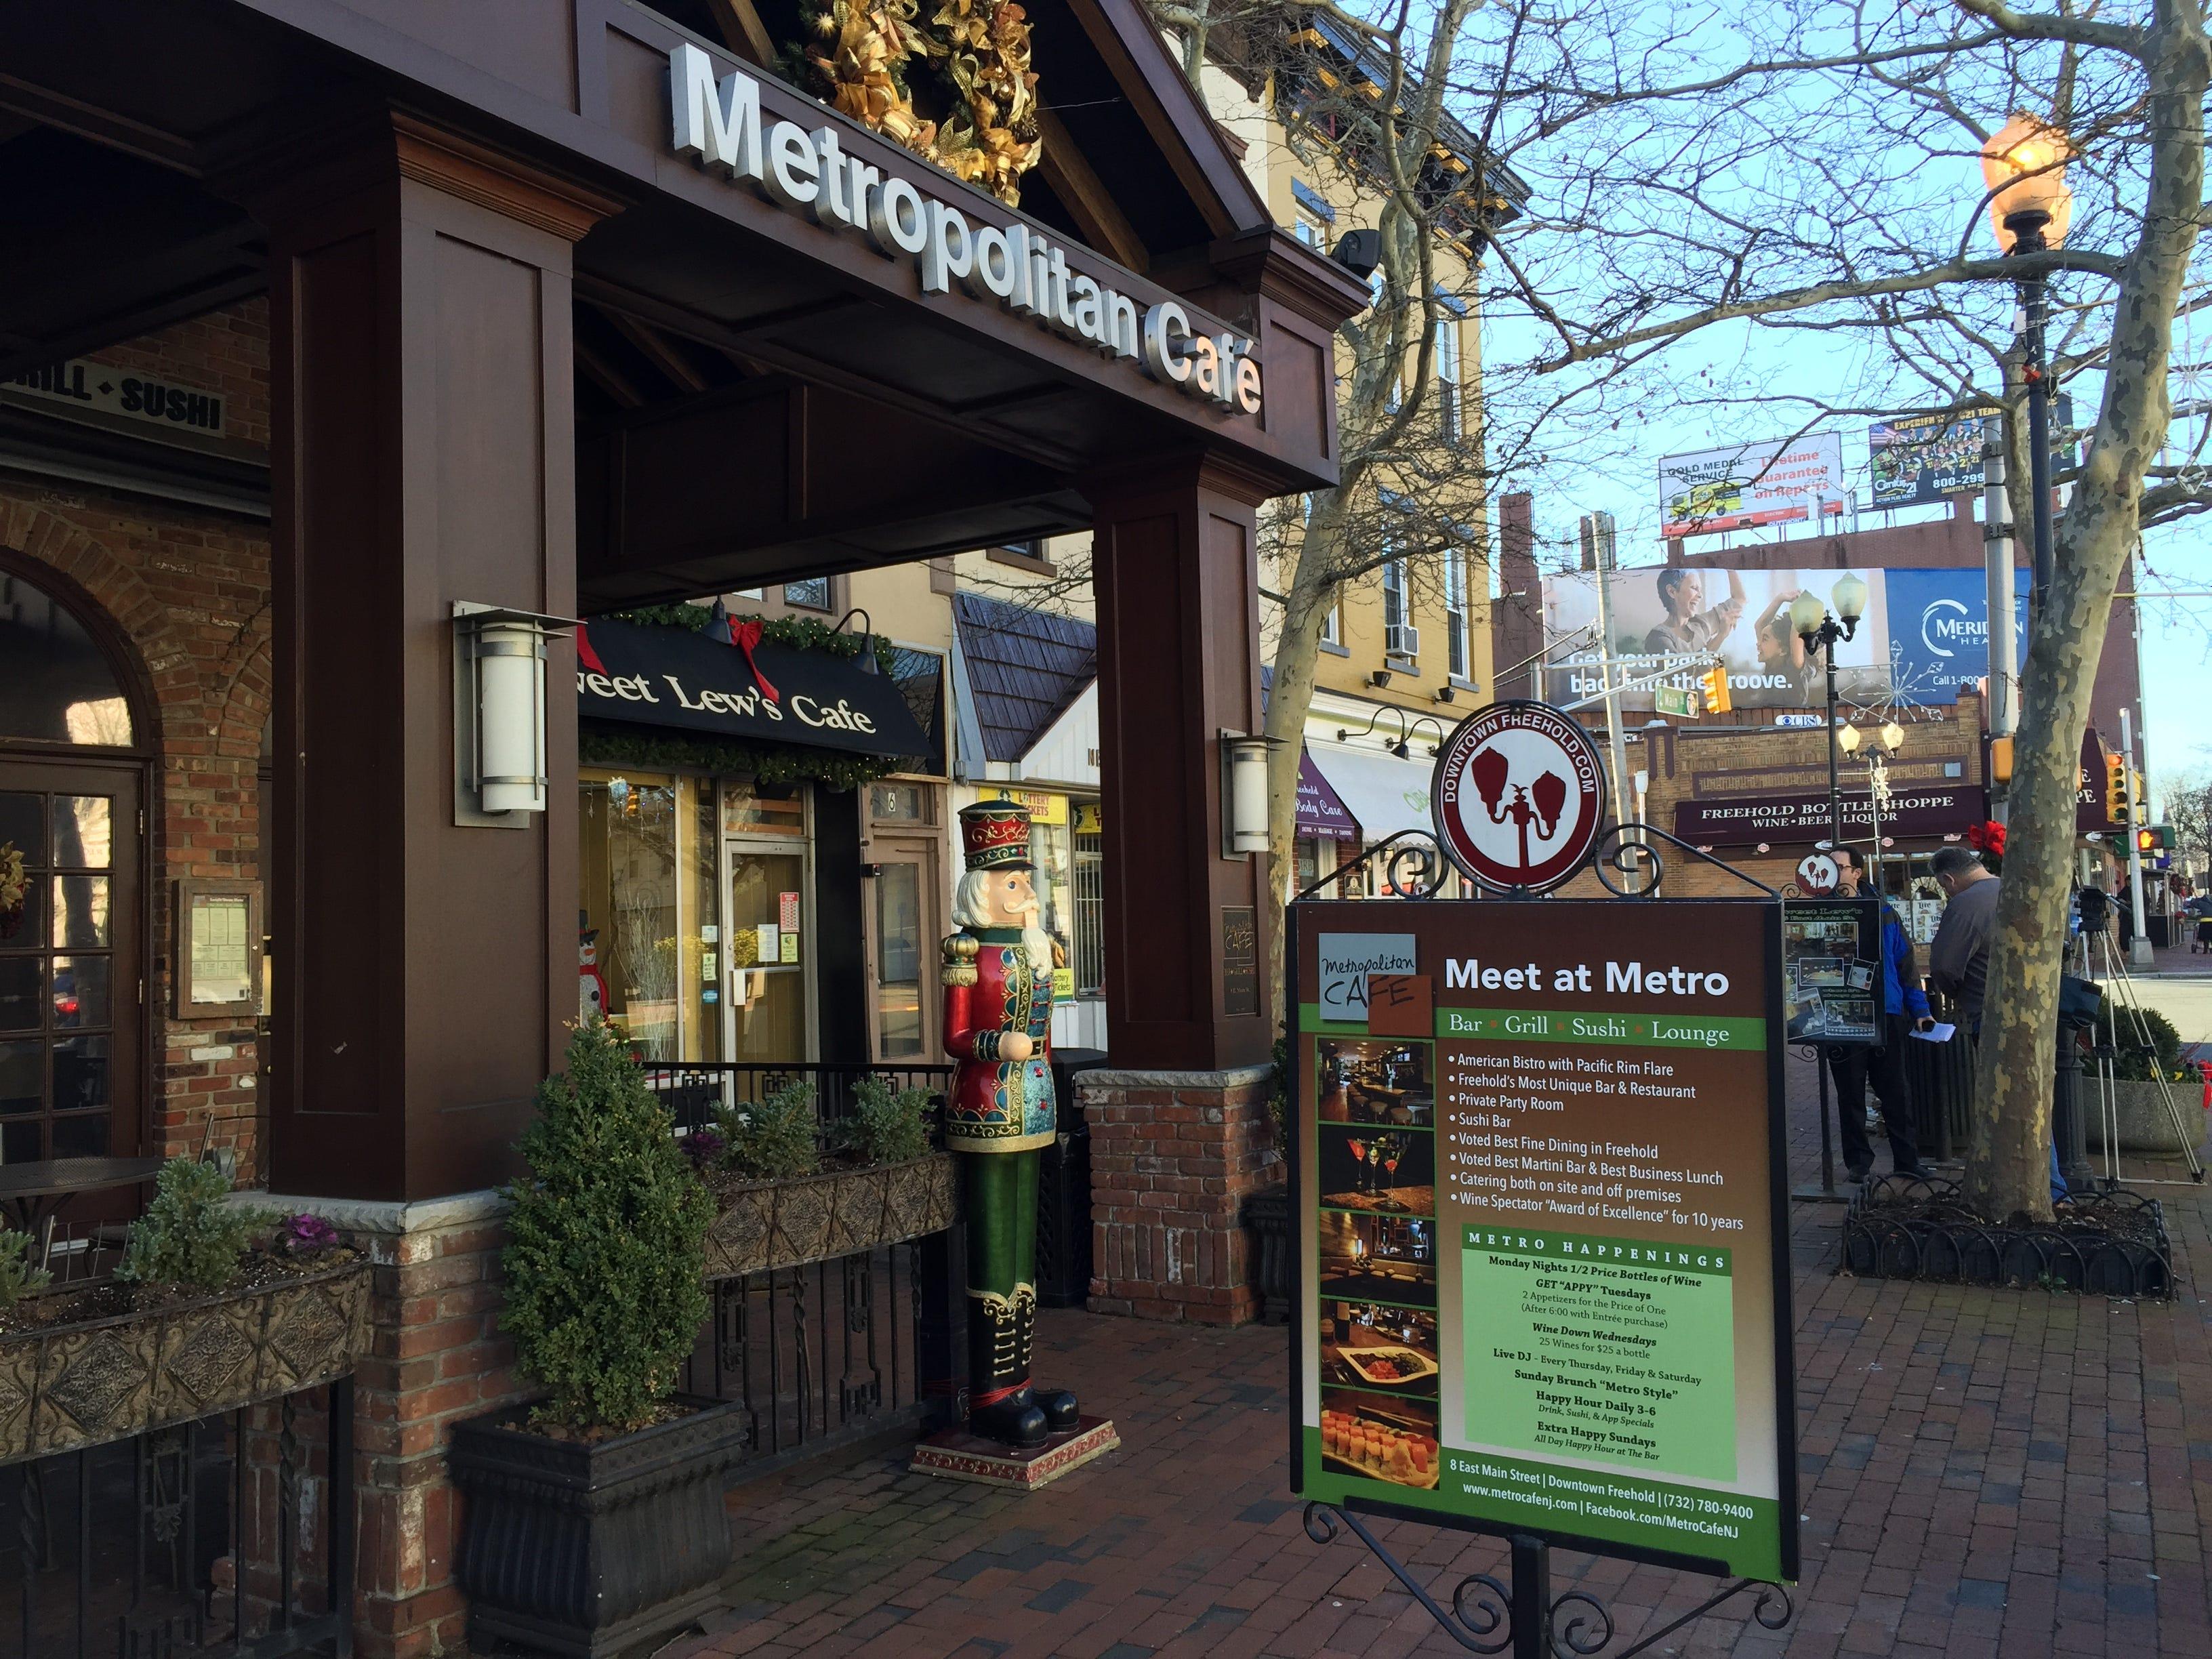 Metropolitan cafe freehold nj